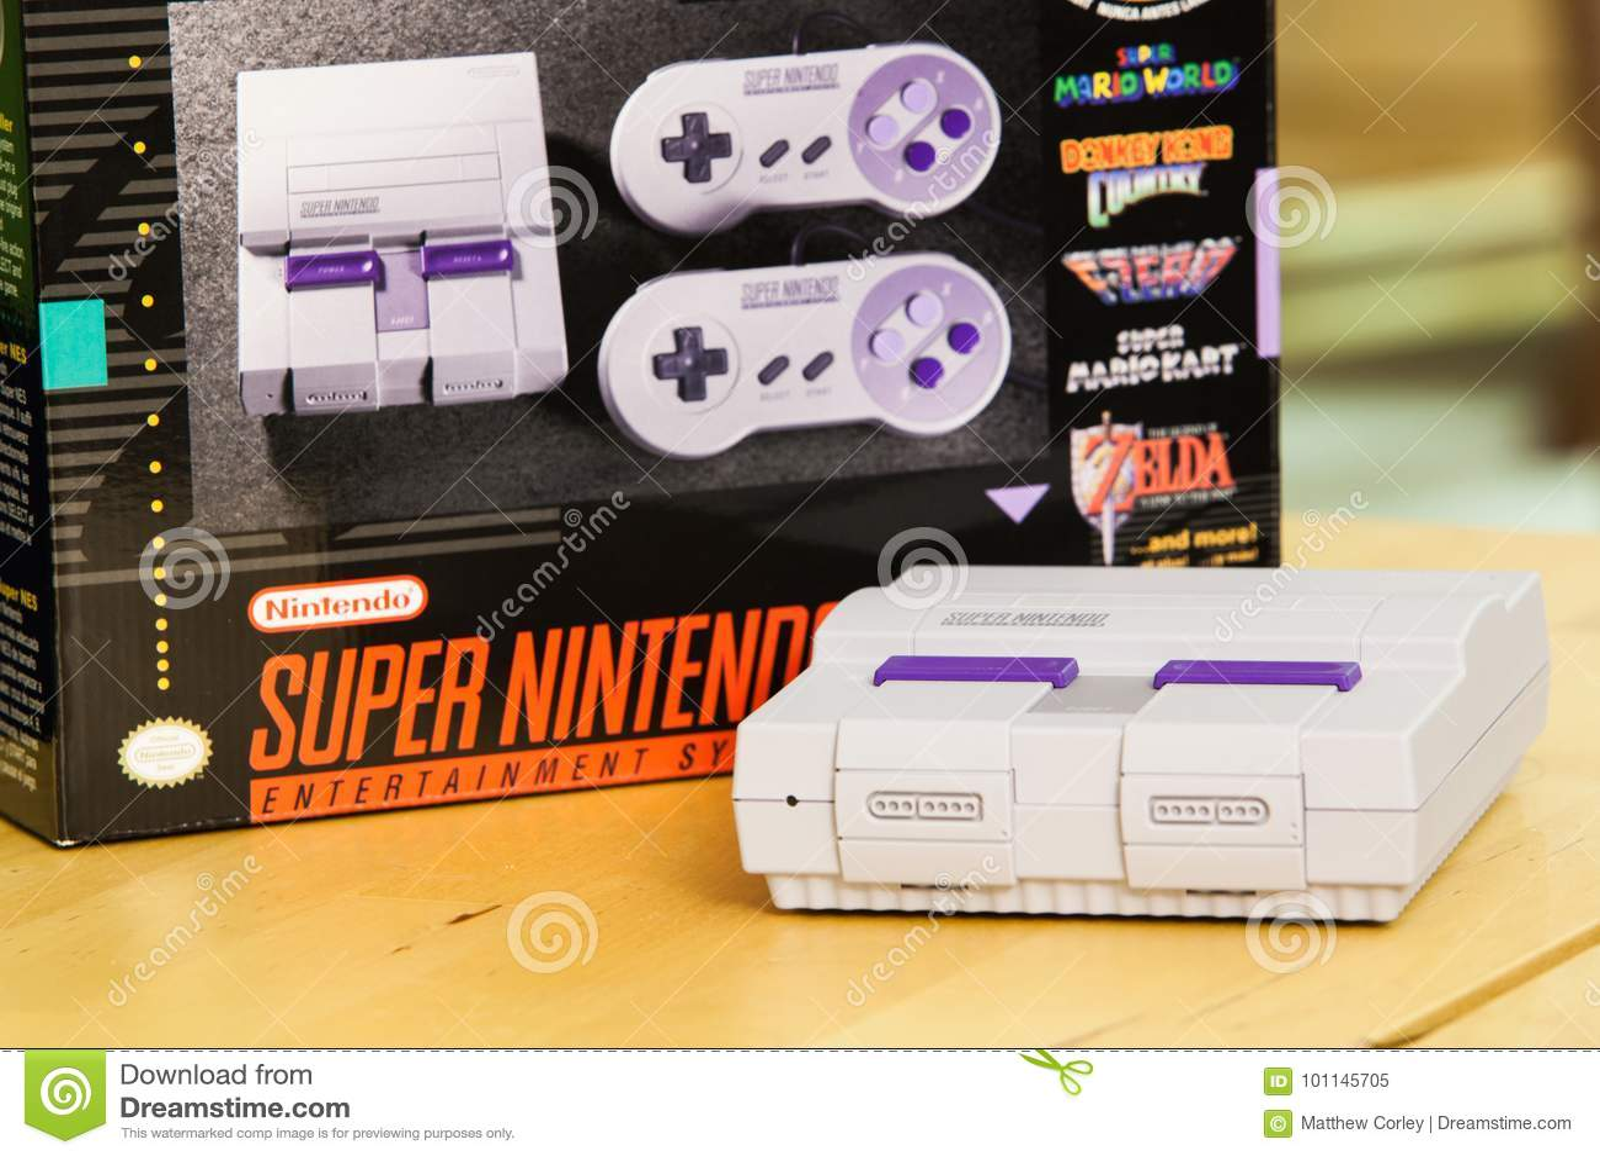 Super Nintendo Classic Edition Console And Box Editorial Image